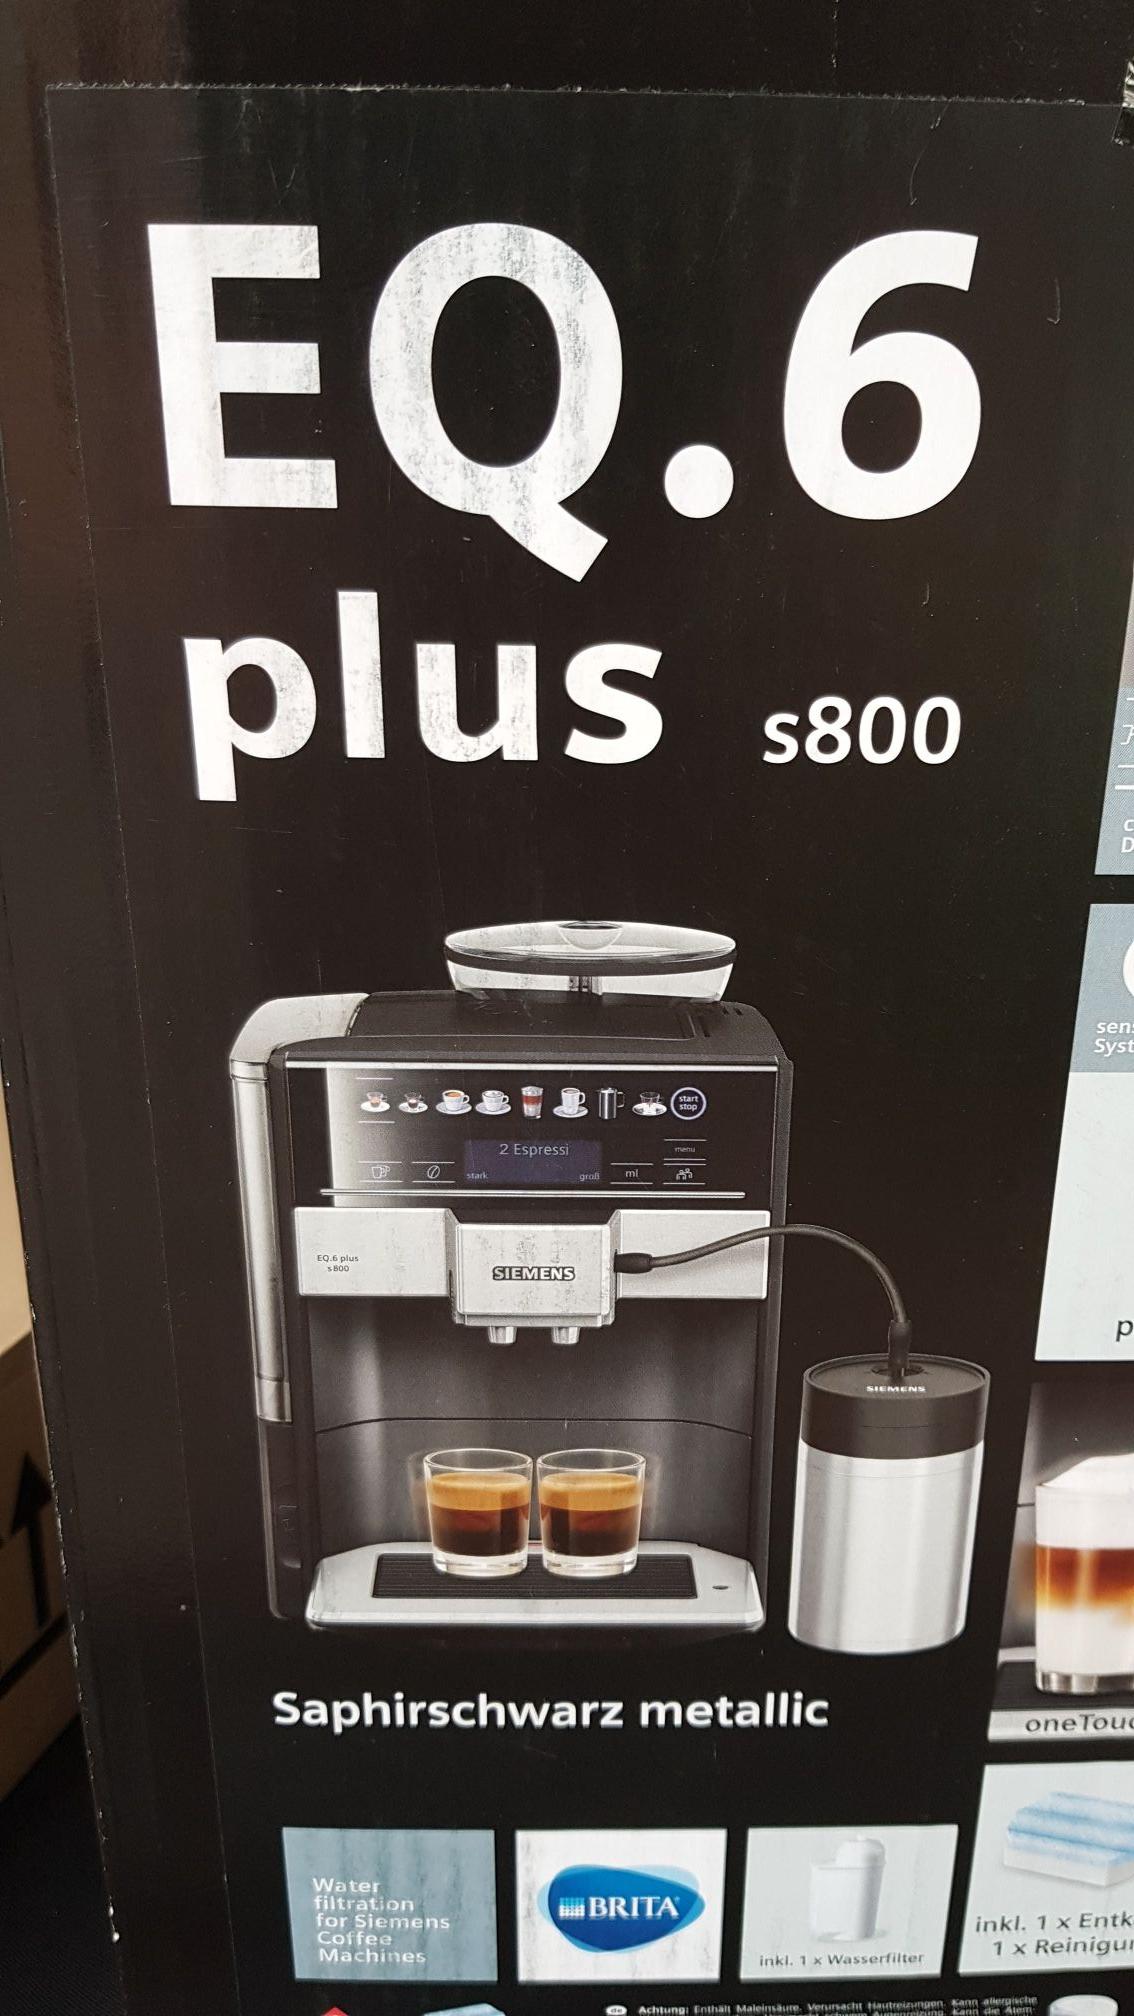 [lokal] Düsseldorf   Für Uns Shop  B-WARE -> Siemens EQ 6 plus s800 + 4 Pflegeset Kaffeevollautomaten